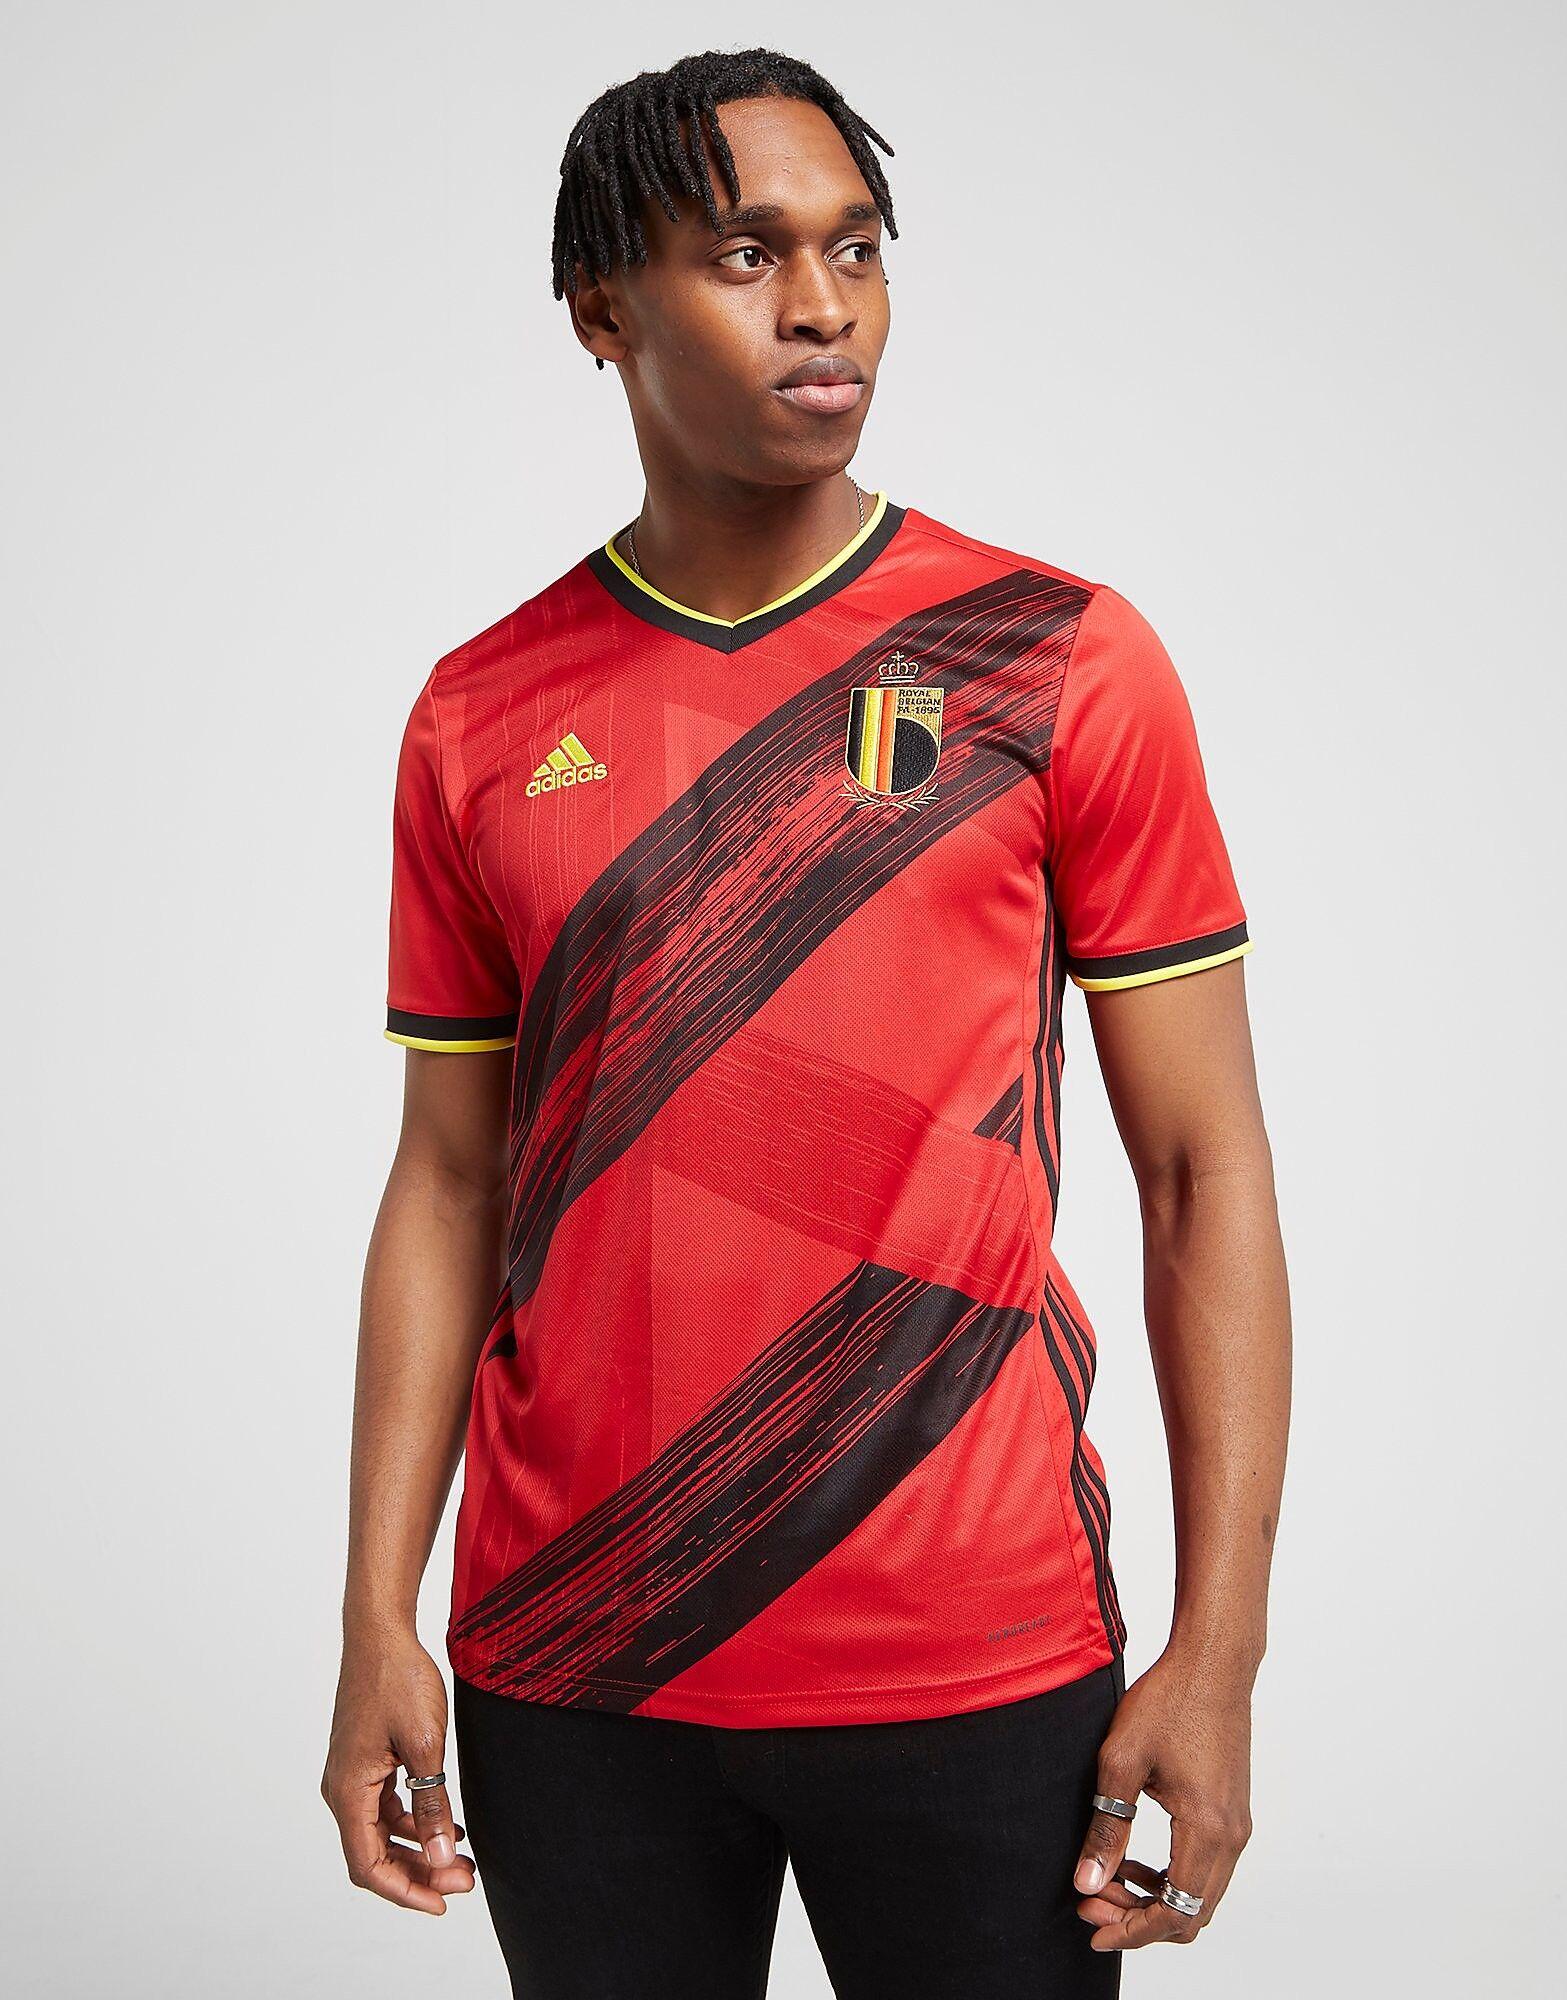 Image of Adidas Belgium 2020 Kotipaita Miehet - Mens, Punainen